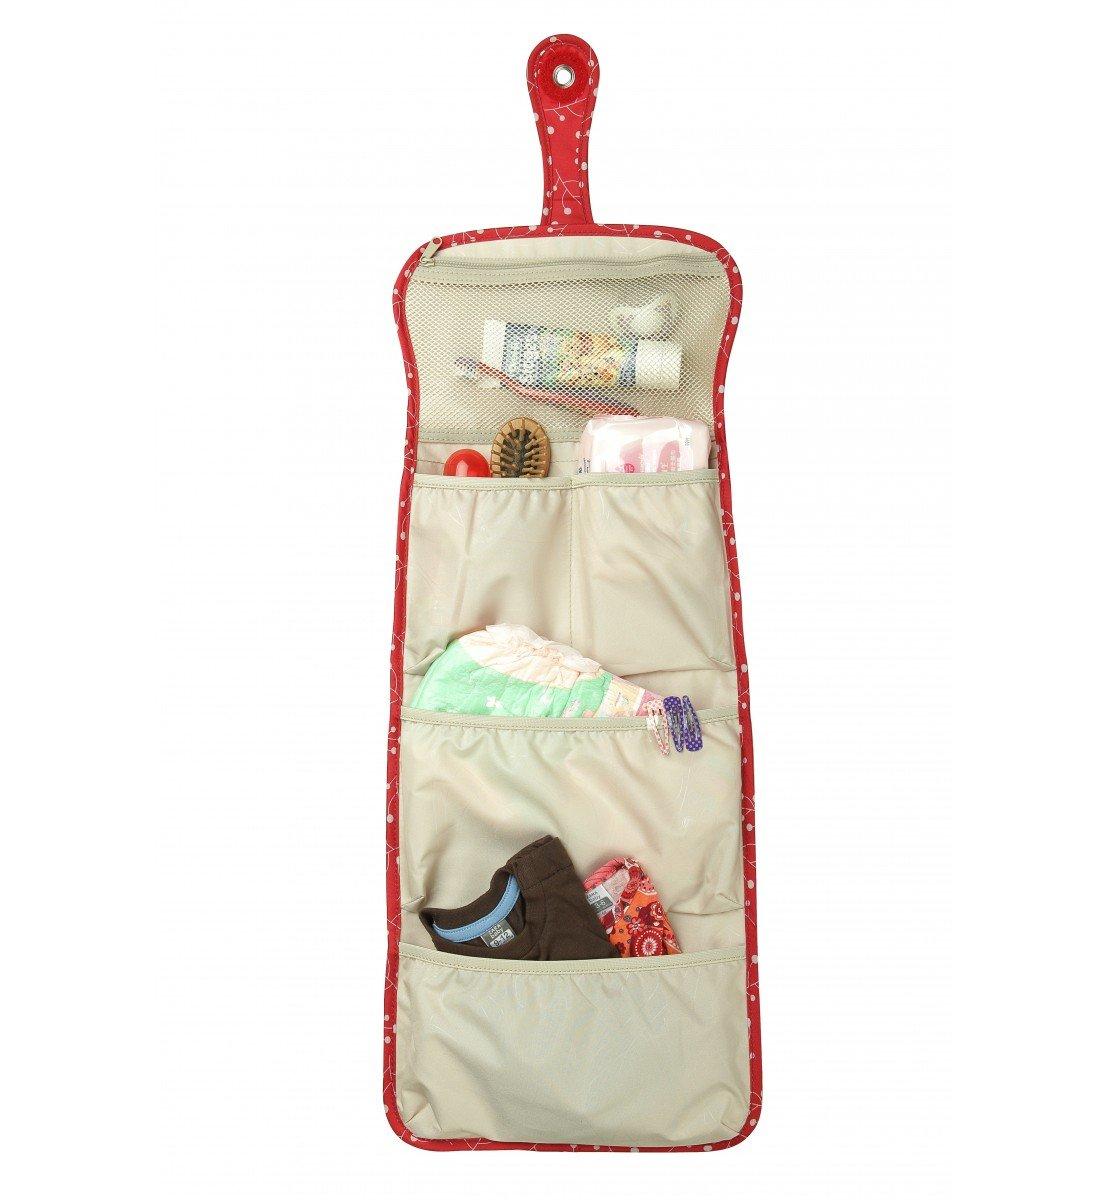 Okiedog Pack A Bag The Clutch Diaper Urban Sumo Dahoma Beige Design Baby Stroller Accessories